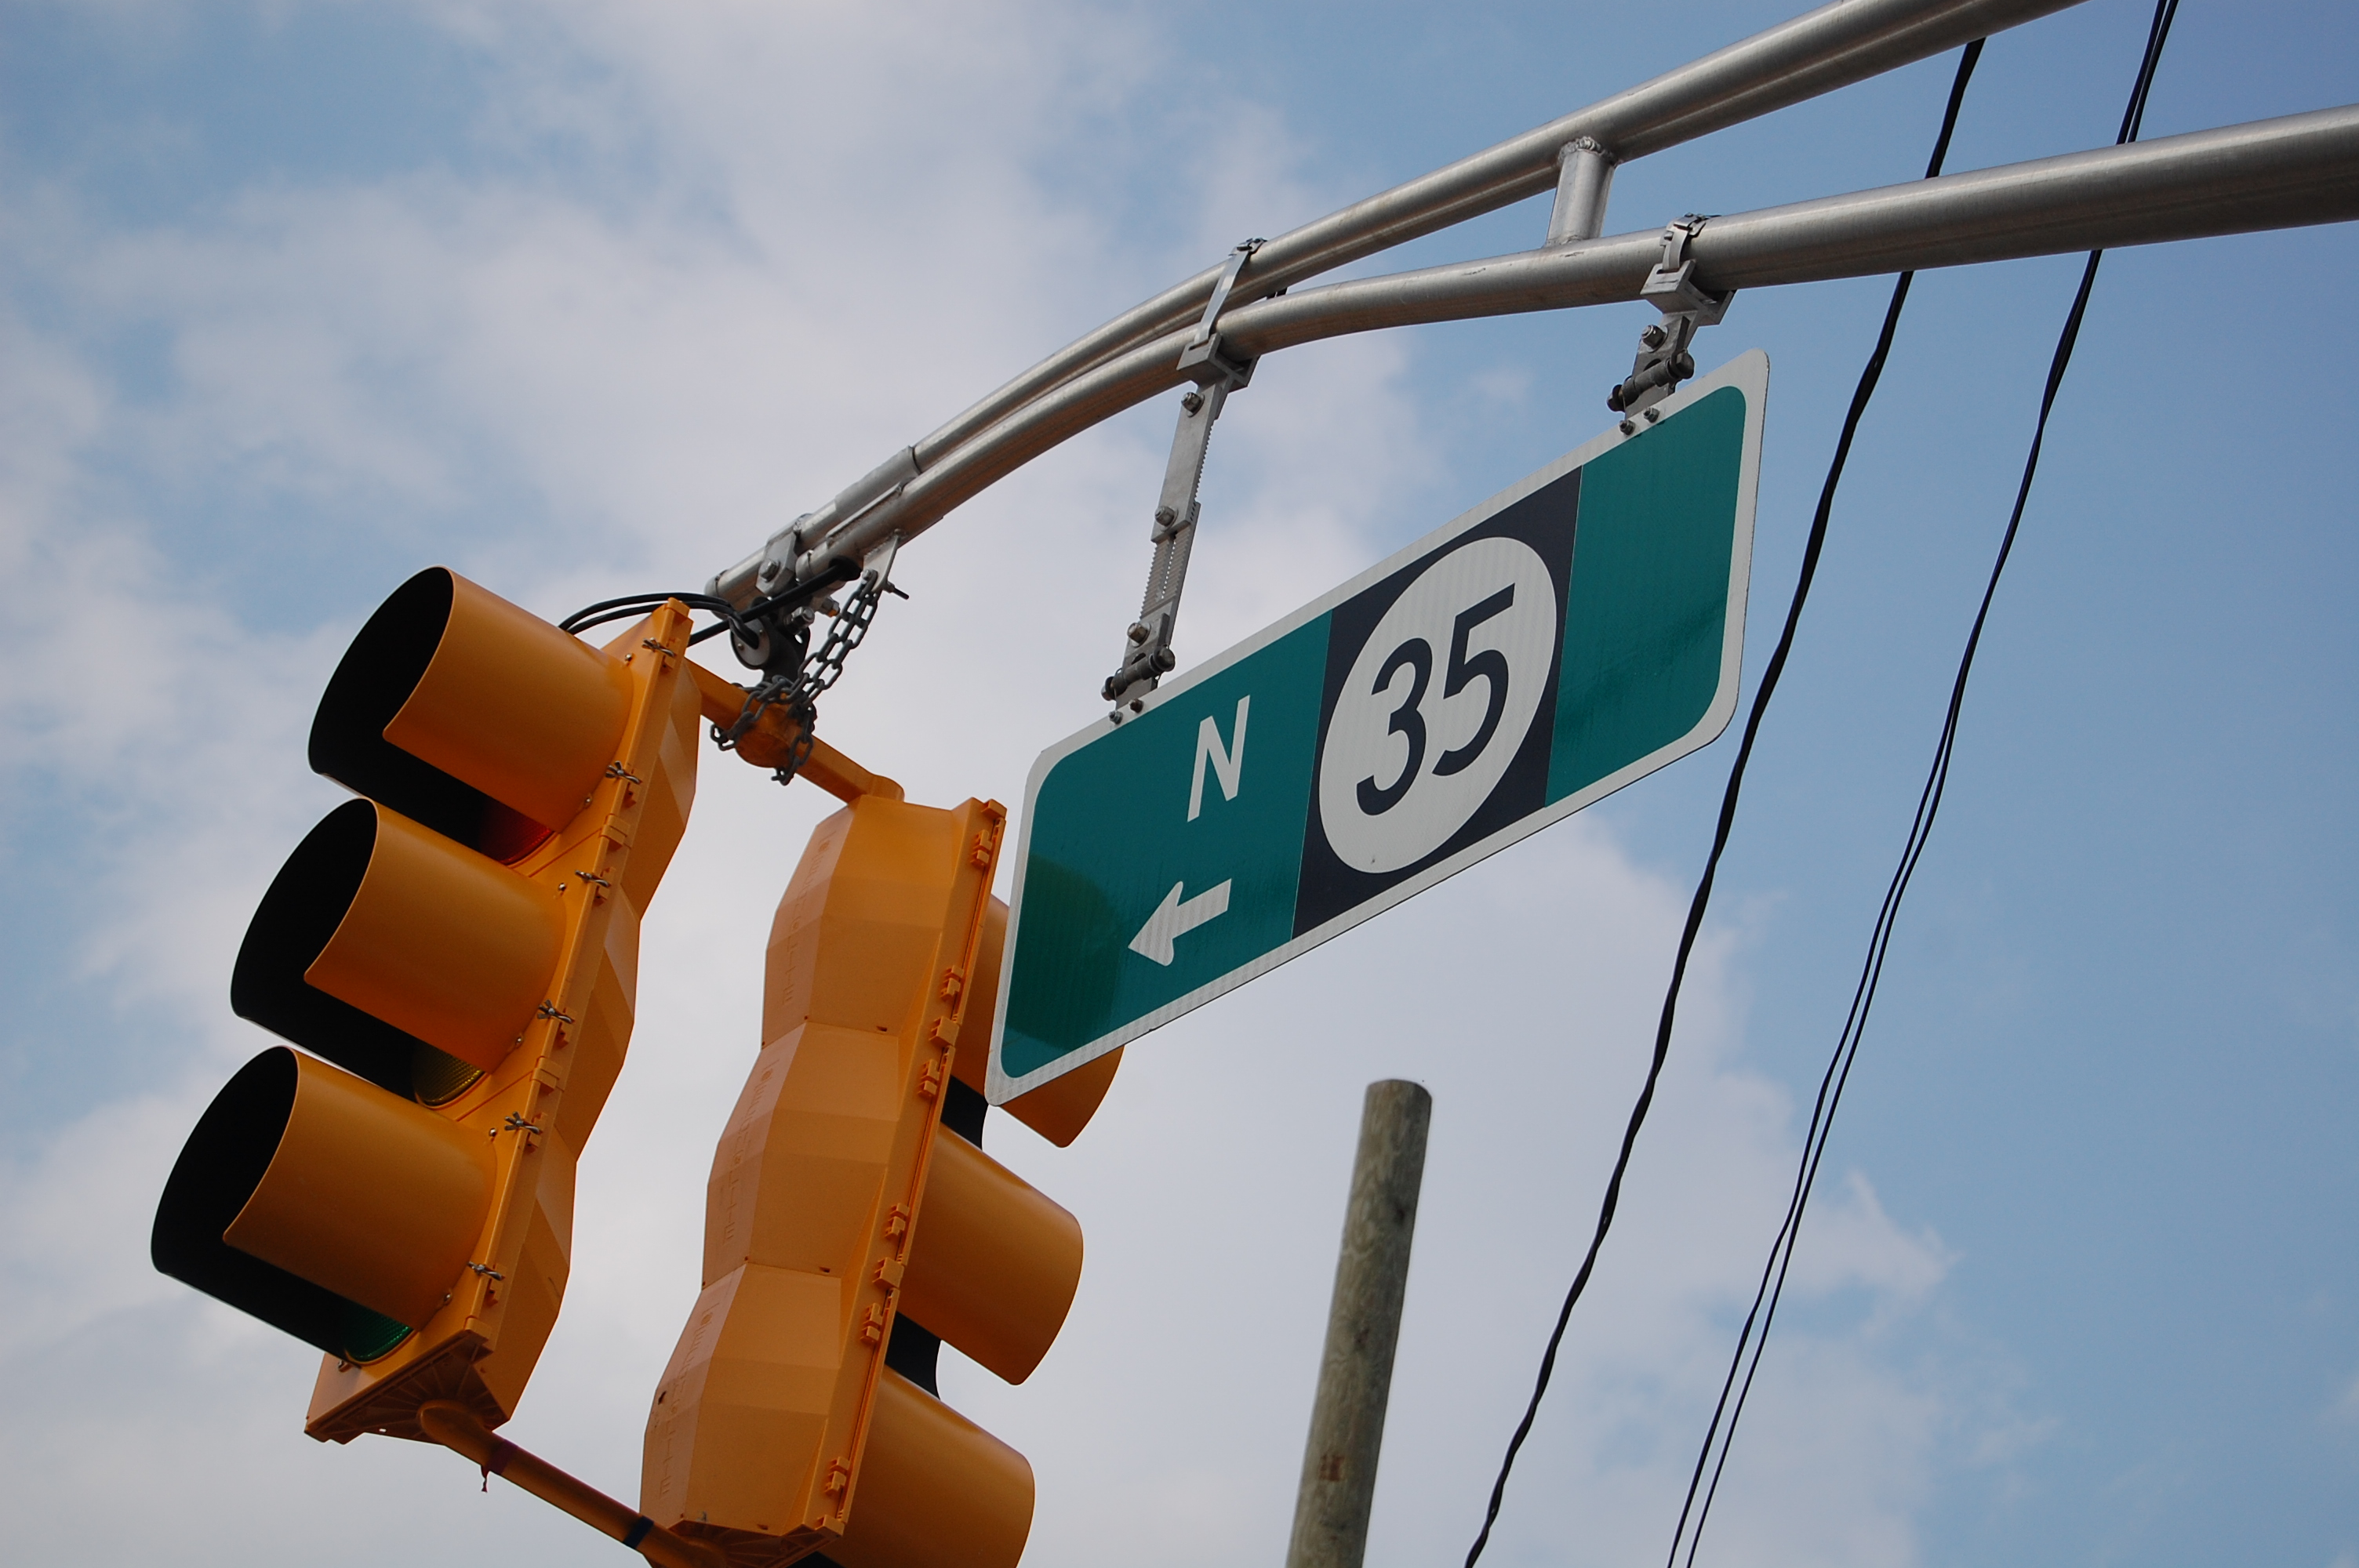 Route 35 (Photo: Daniel Nee)